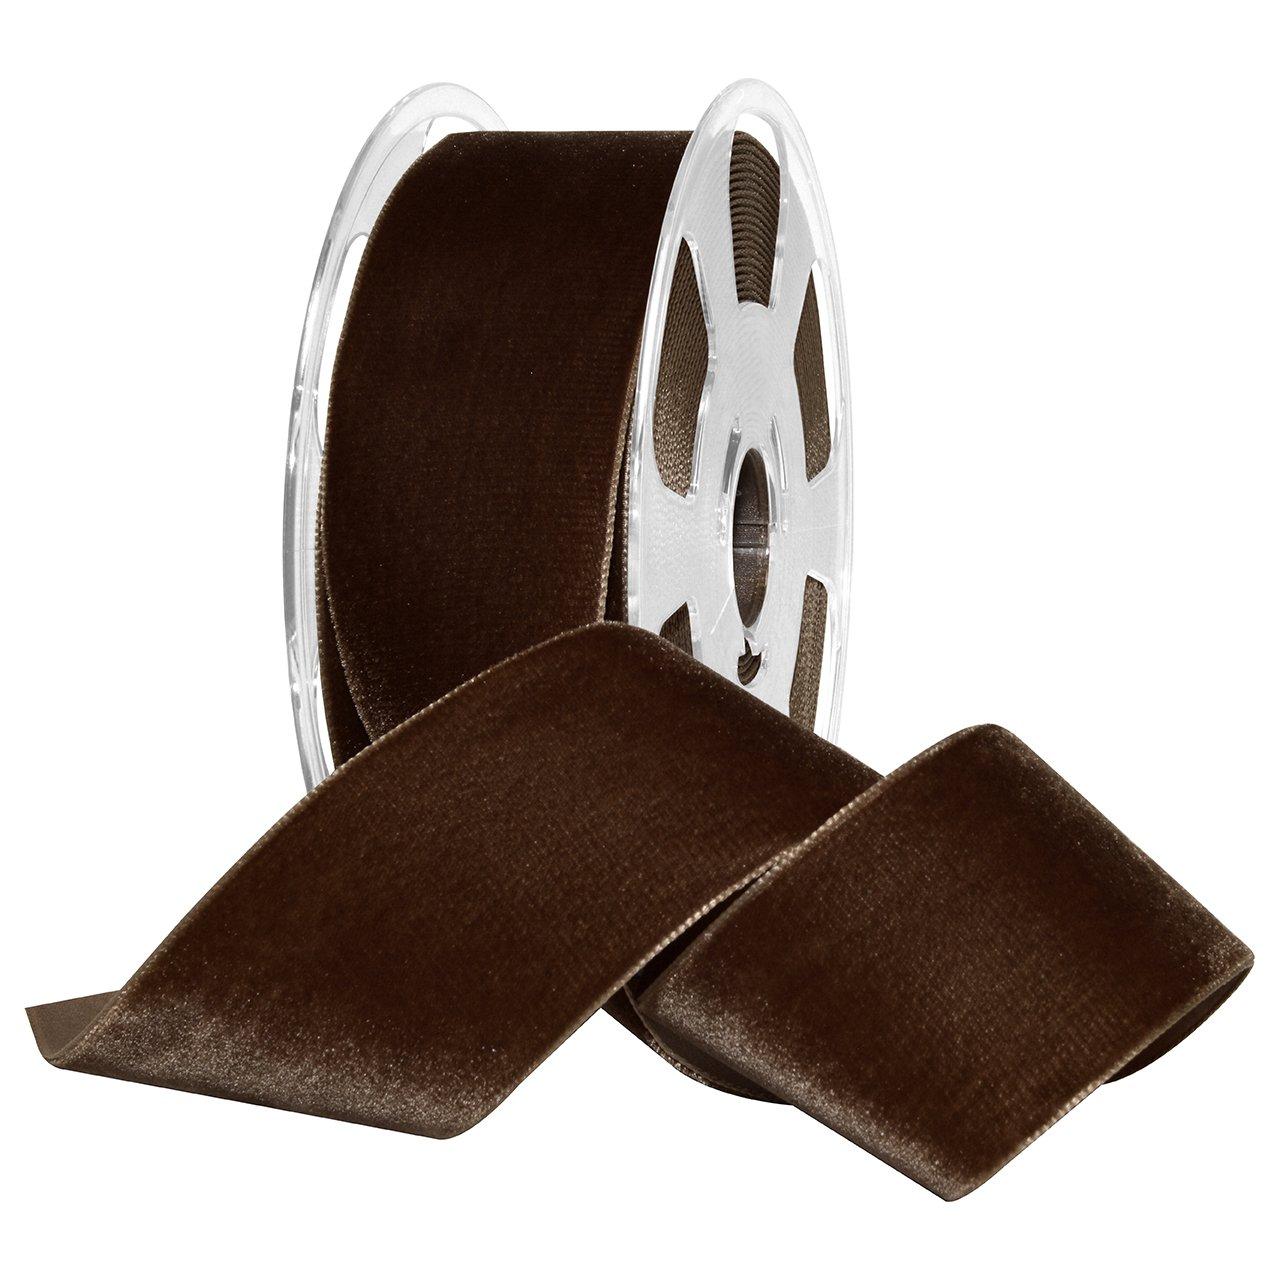 Morex Ribbon, Nylon, 2 inches by 11 Yards, Café, Item 01250/10-636 Nylvalour Velvet Ribbon, 2